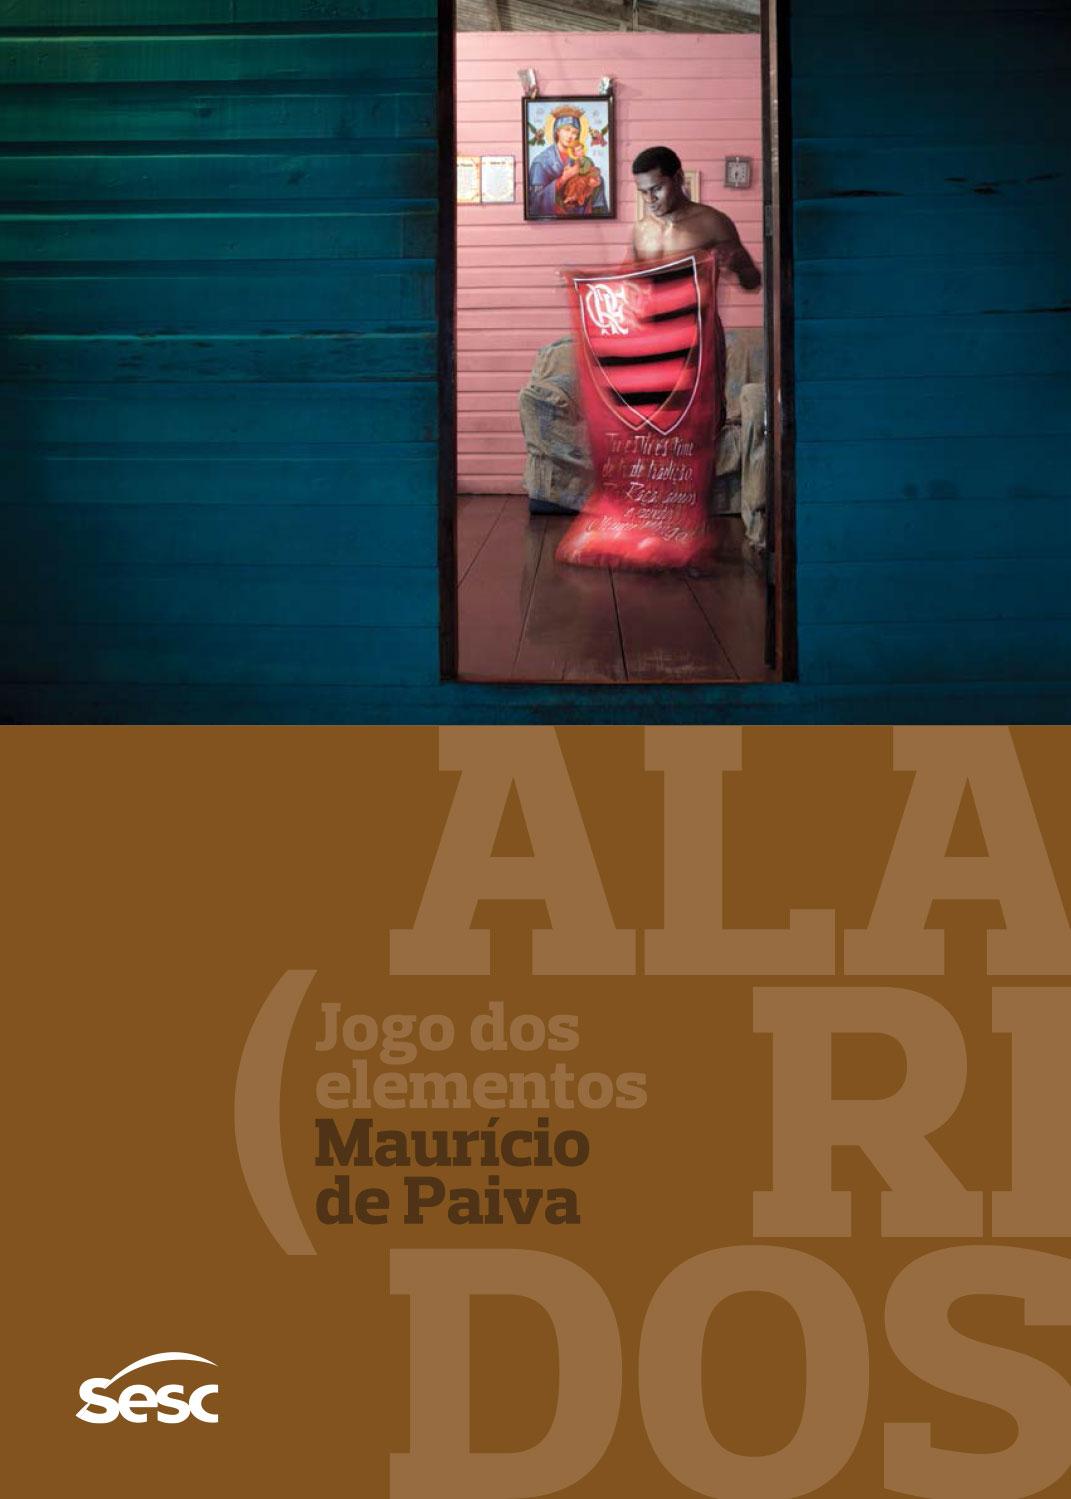 Catalogue design for the  Alaridos, jogo dos elementos  exhibition. | Sesc Itaquera, January-May 2015. Photo: Maurício de Paiva